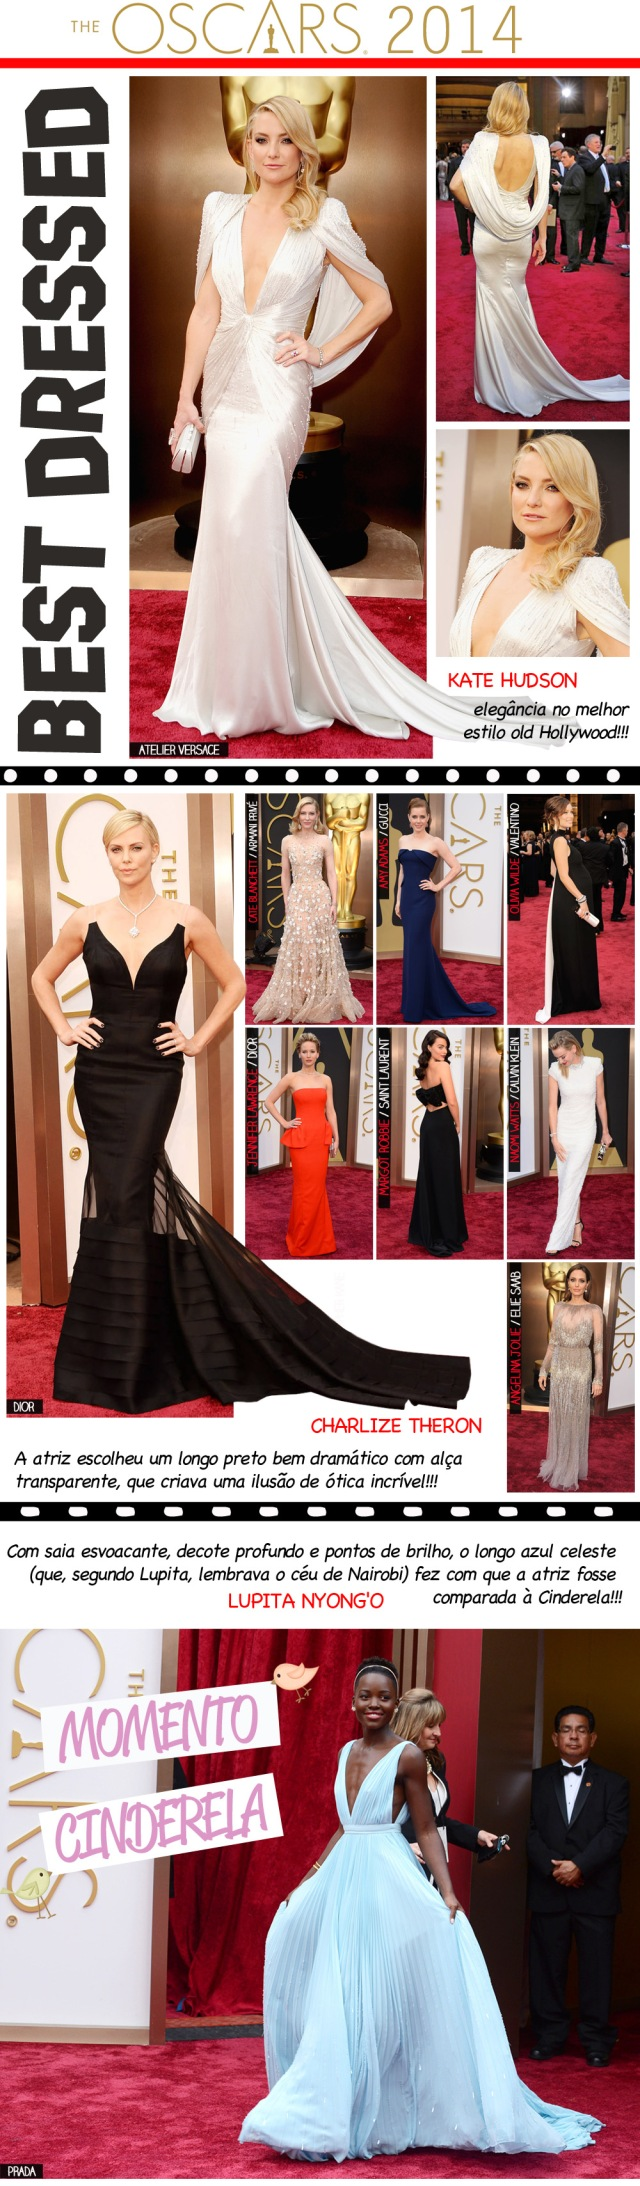 fdn-oscar-2014-red-carpet-best-dressed-kate-hudson-lupita-nyongo-charlize-theron